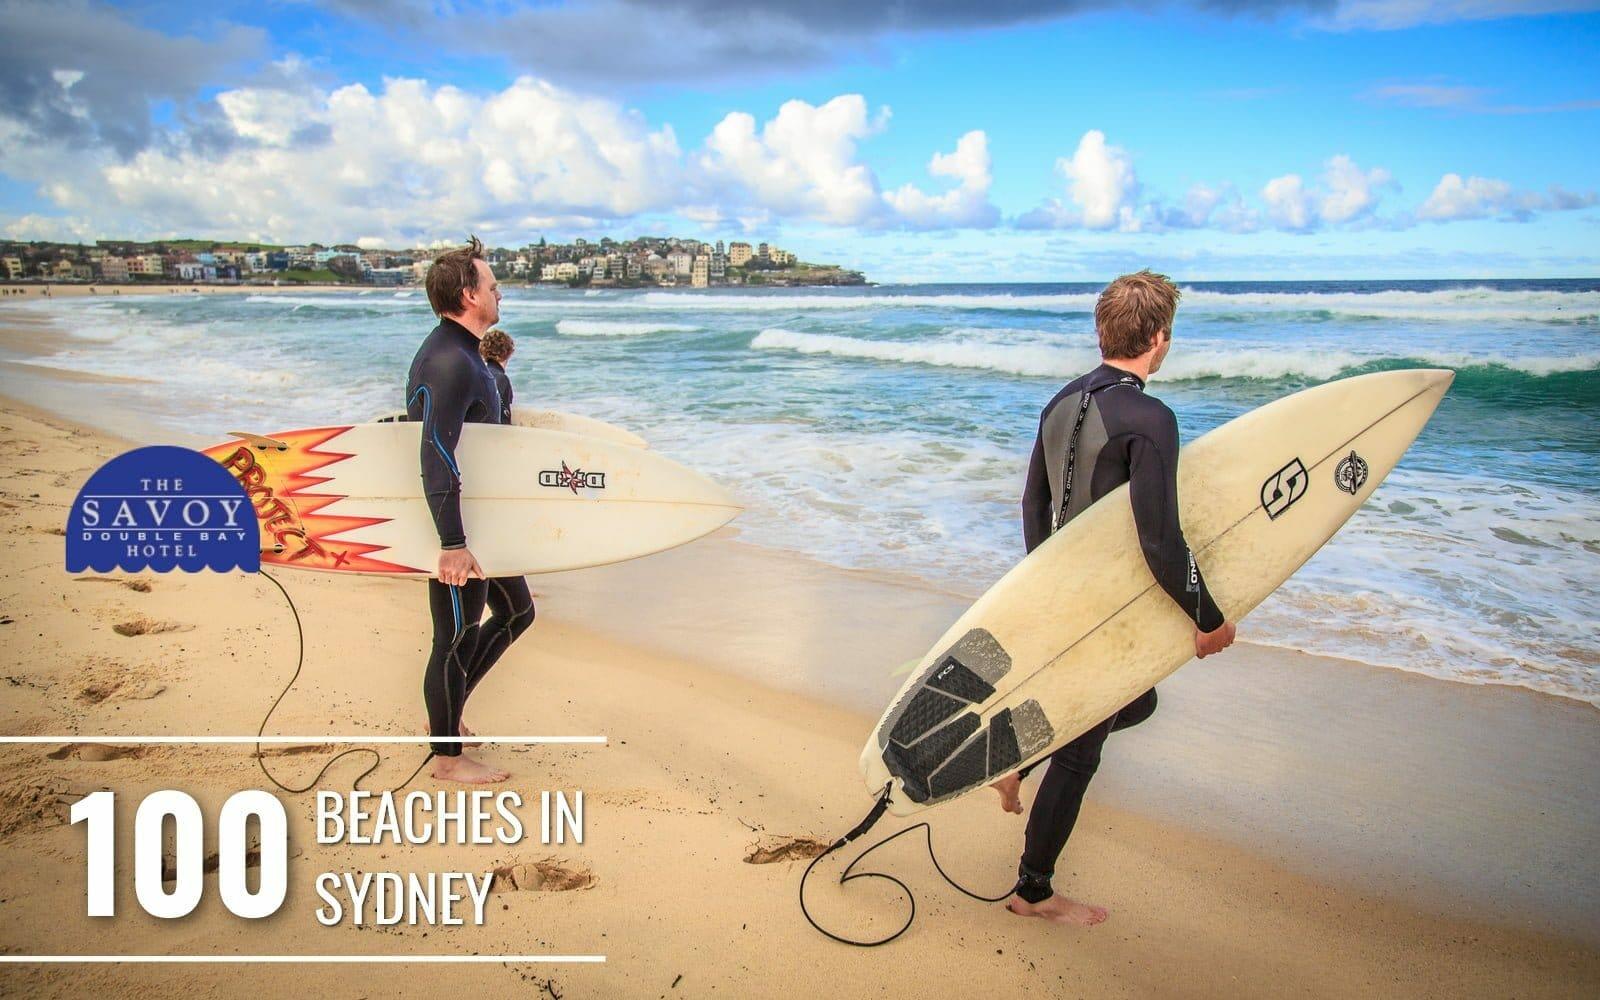 What Makes Sydney the Best City in Australia? - Sydney